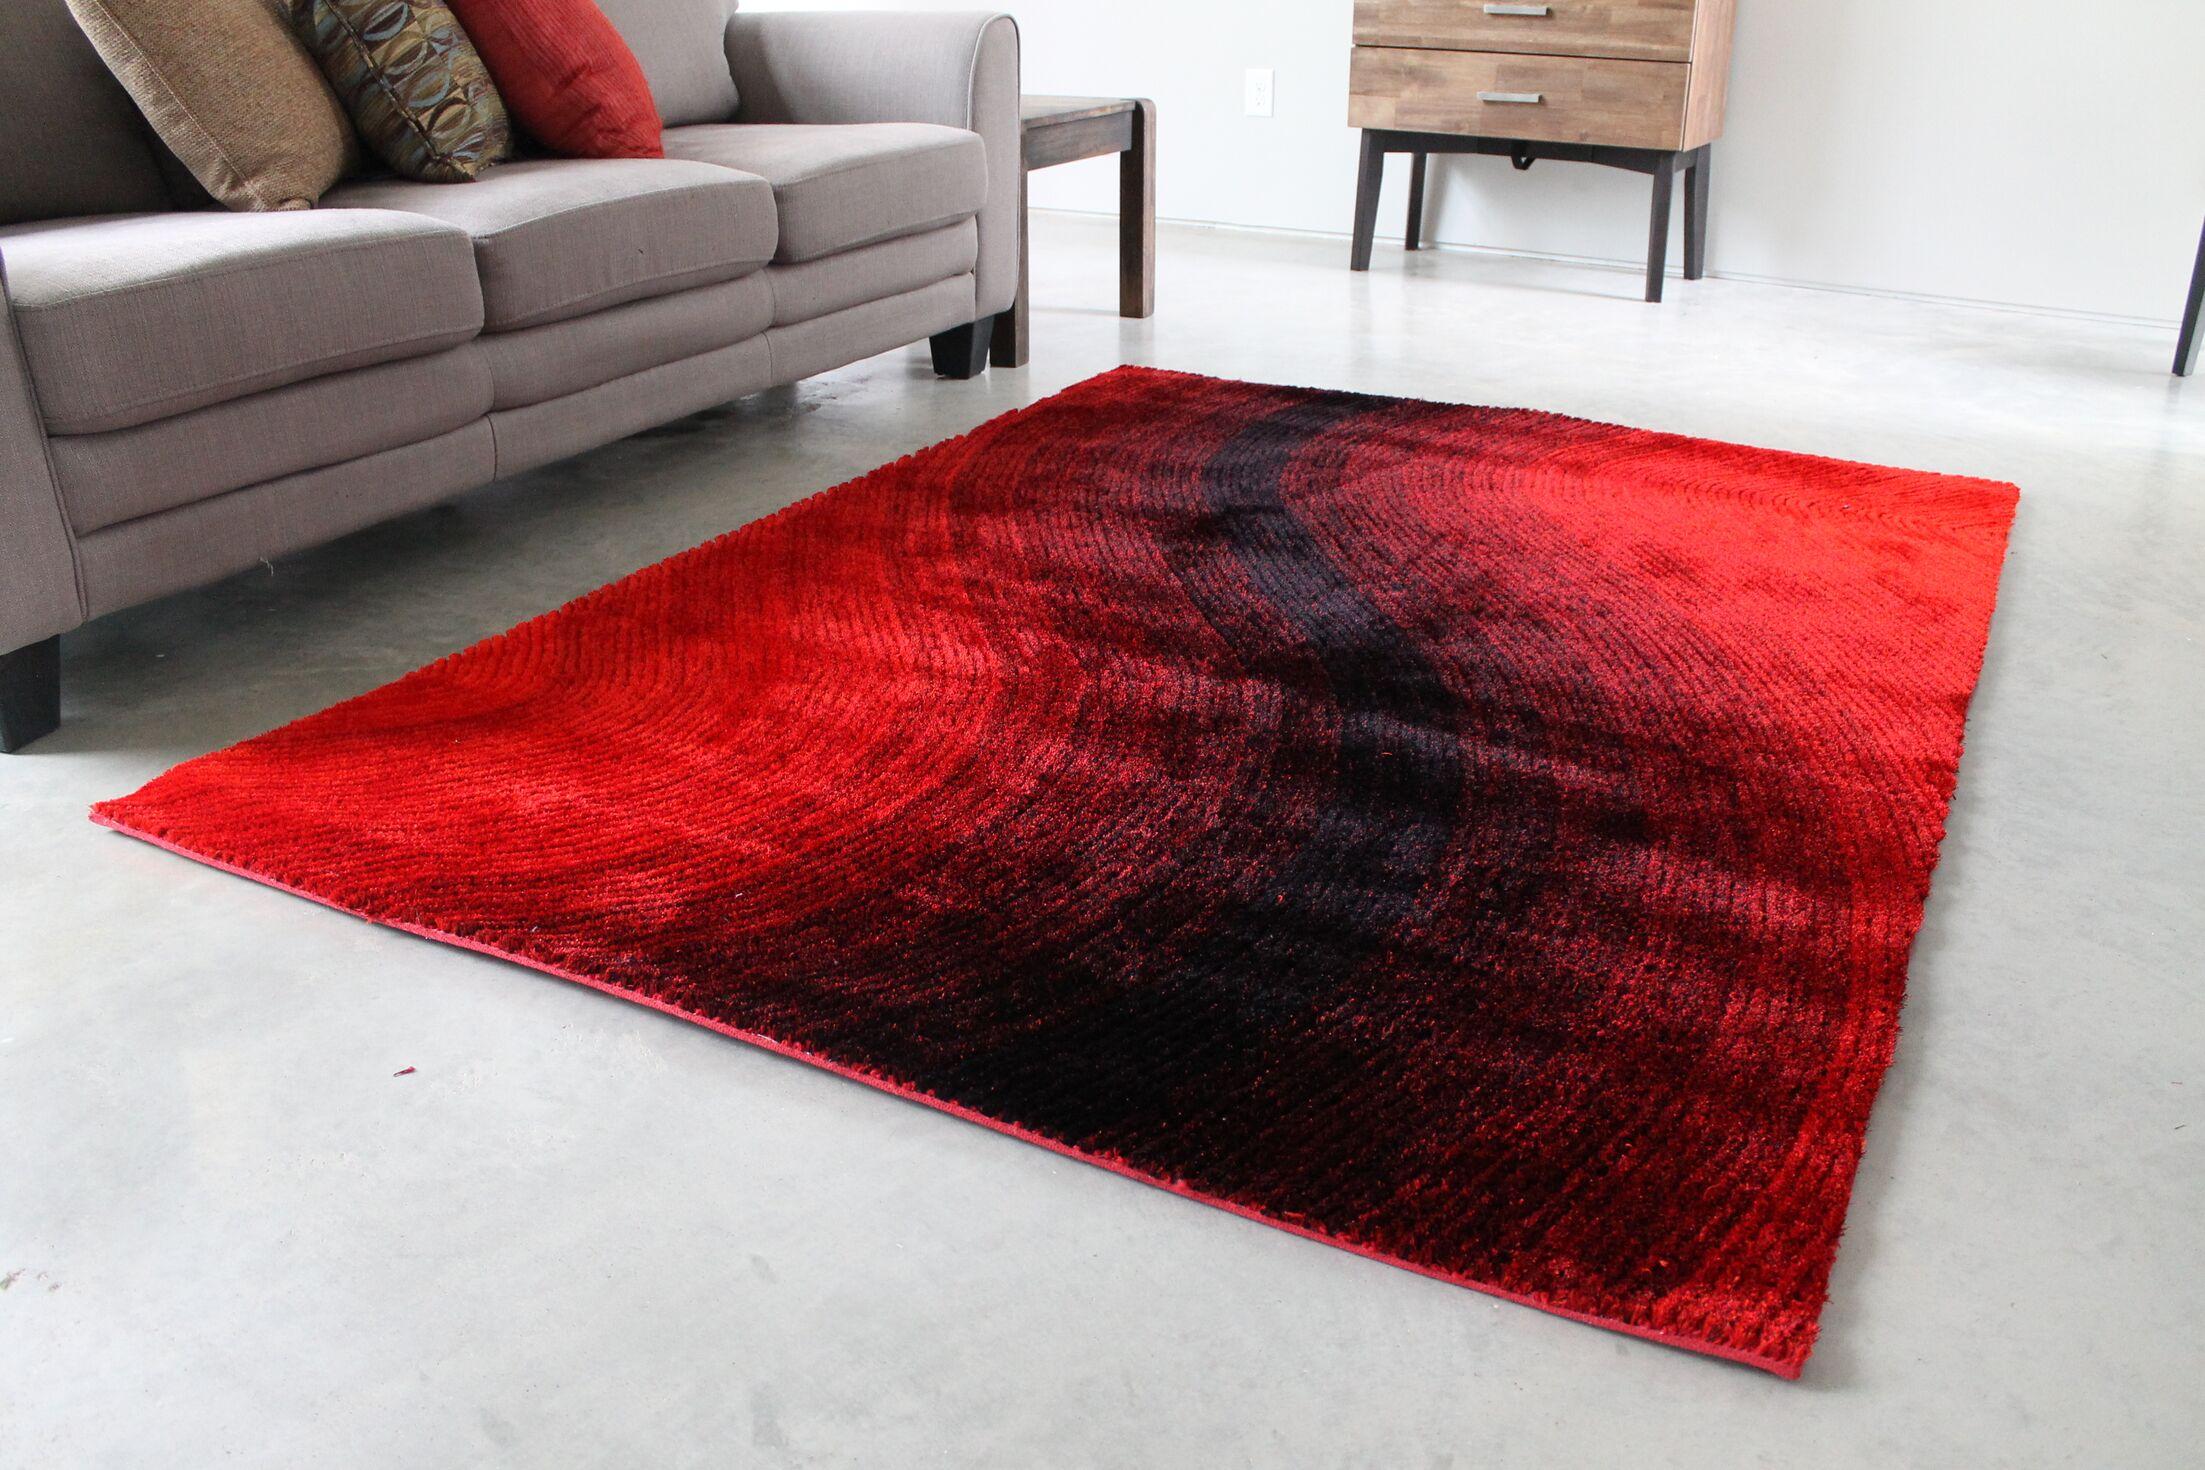 Red/Black Area Rug